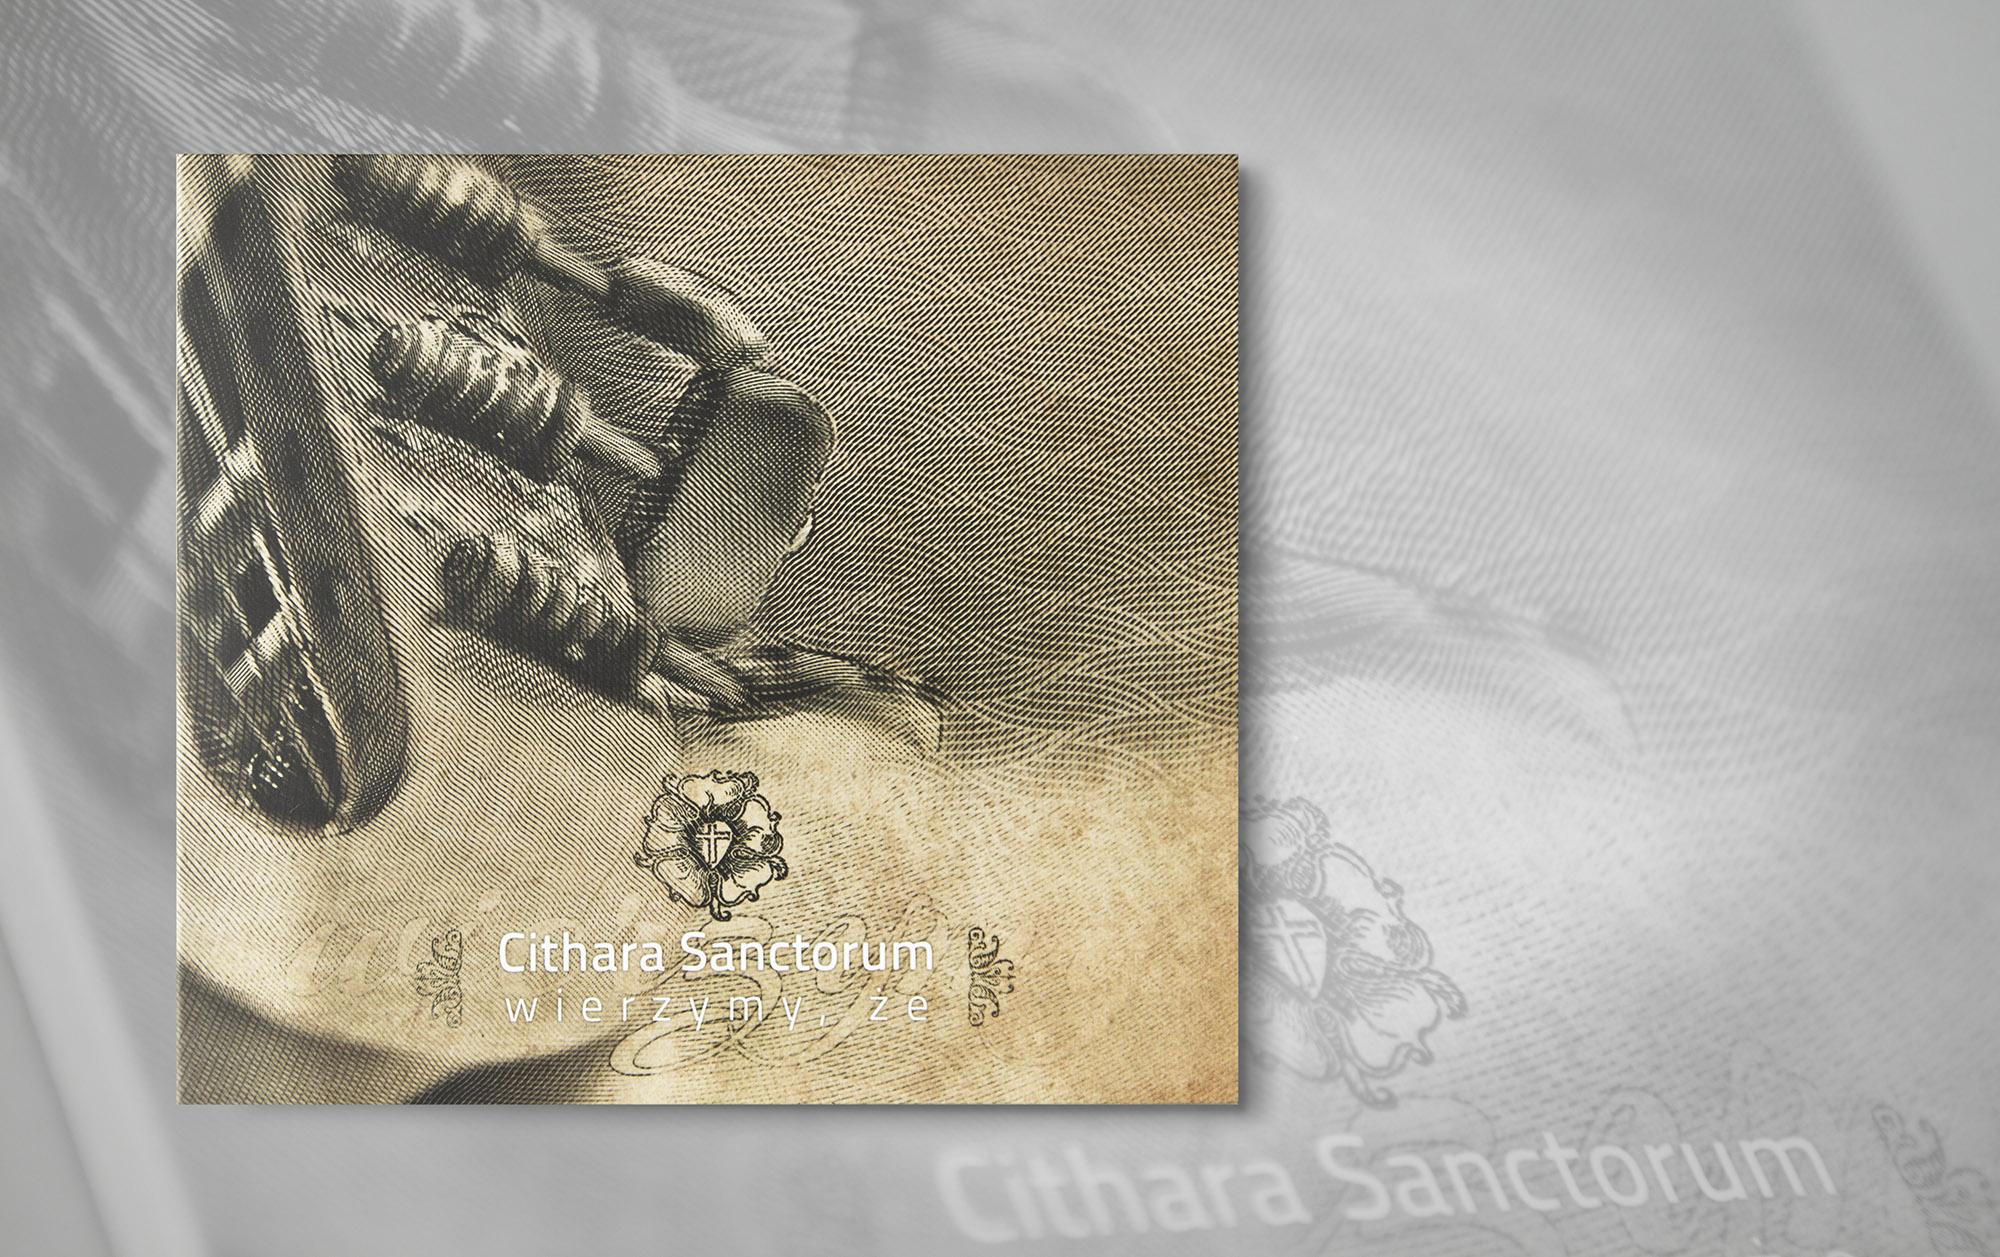 projekty graficzne, design folder, newspaper, ilustracja, concept art, key visual, designer Ireneusz Bloch, cithara sanctorum cd płyta